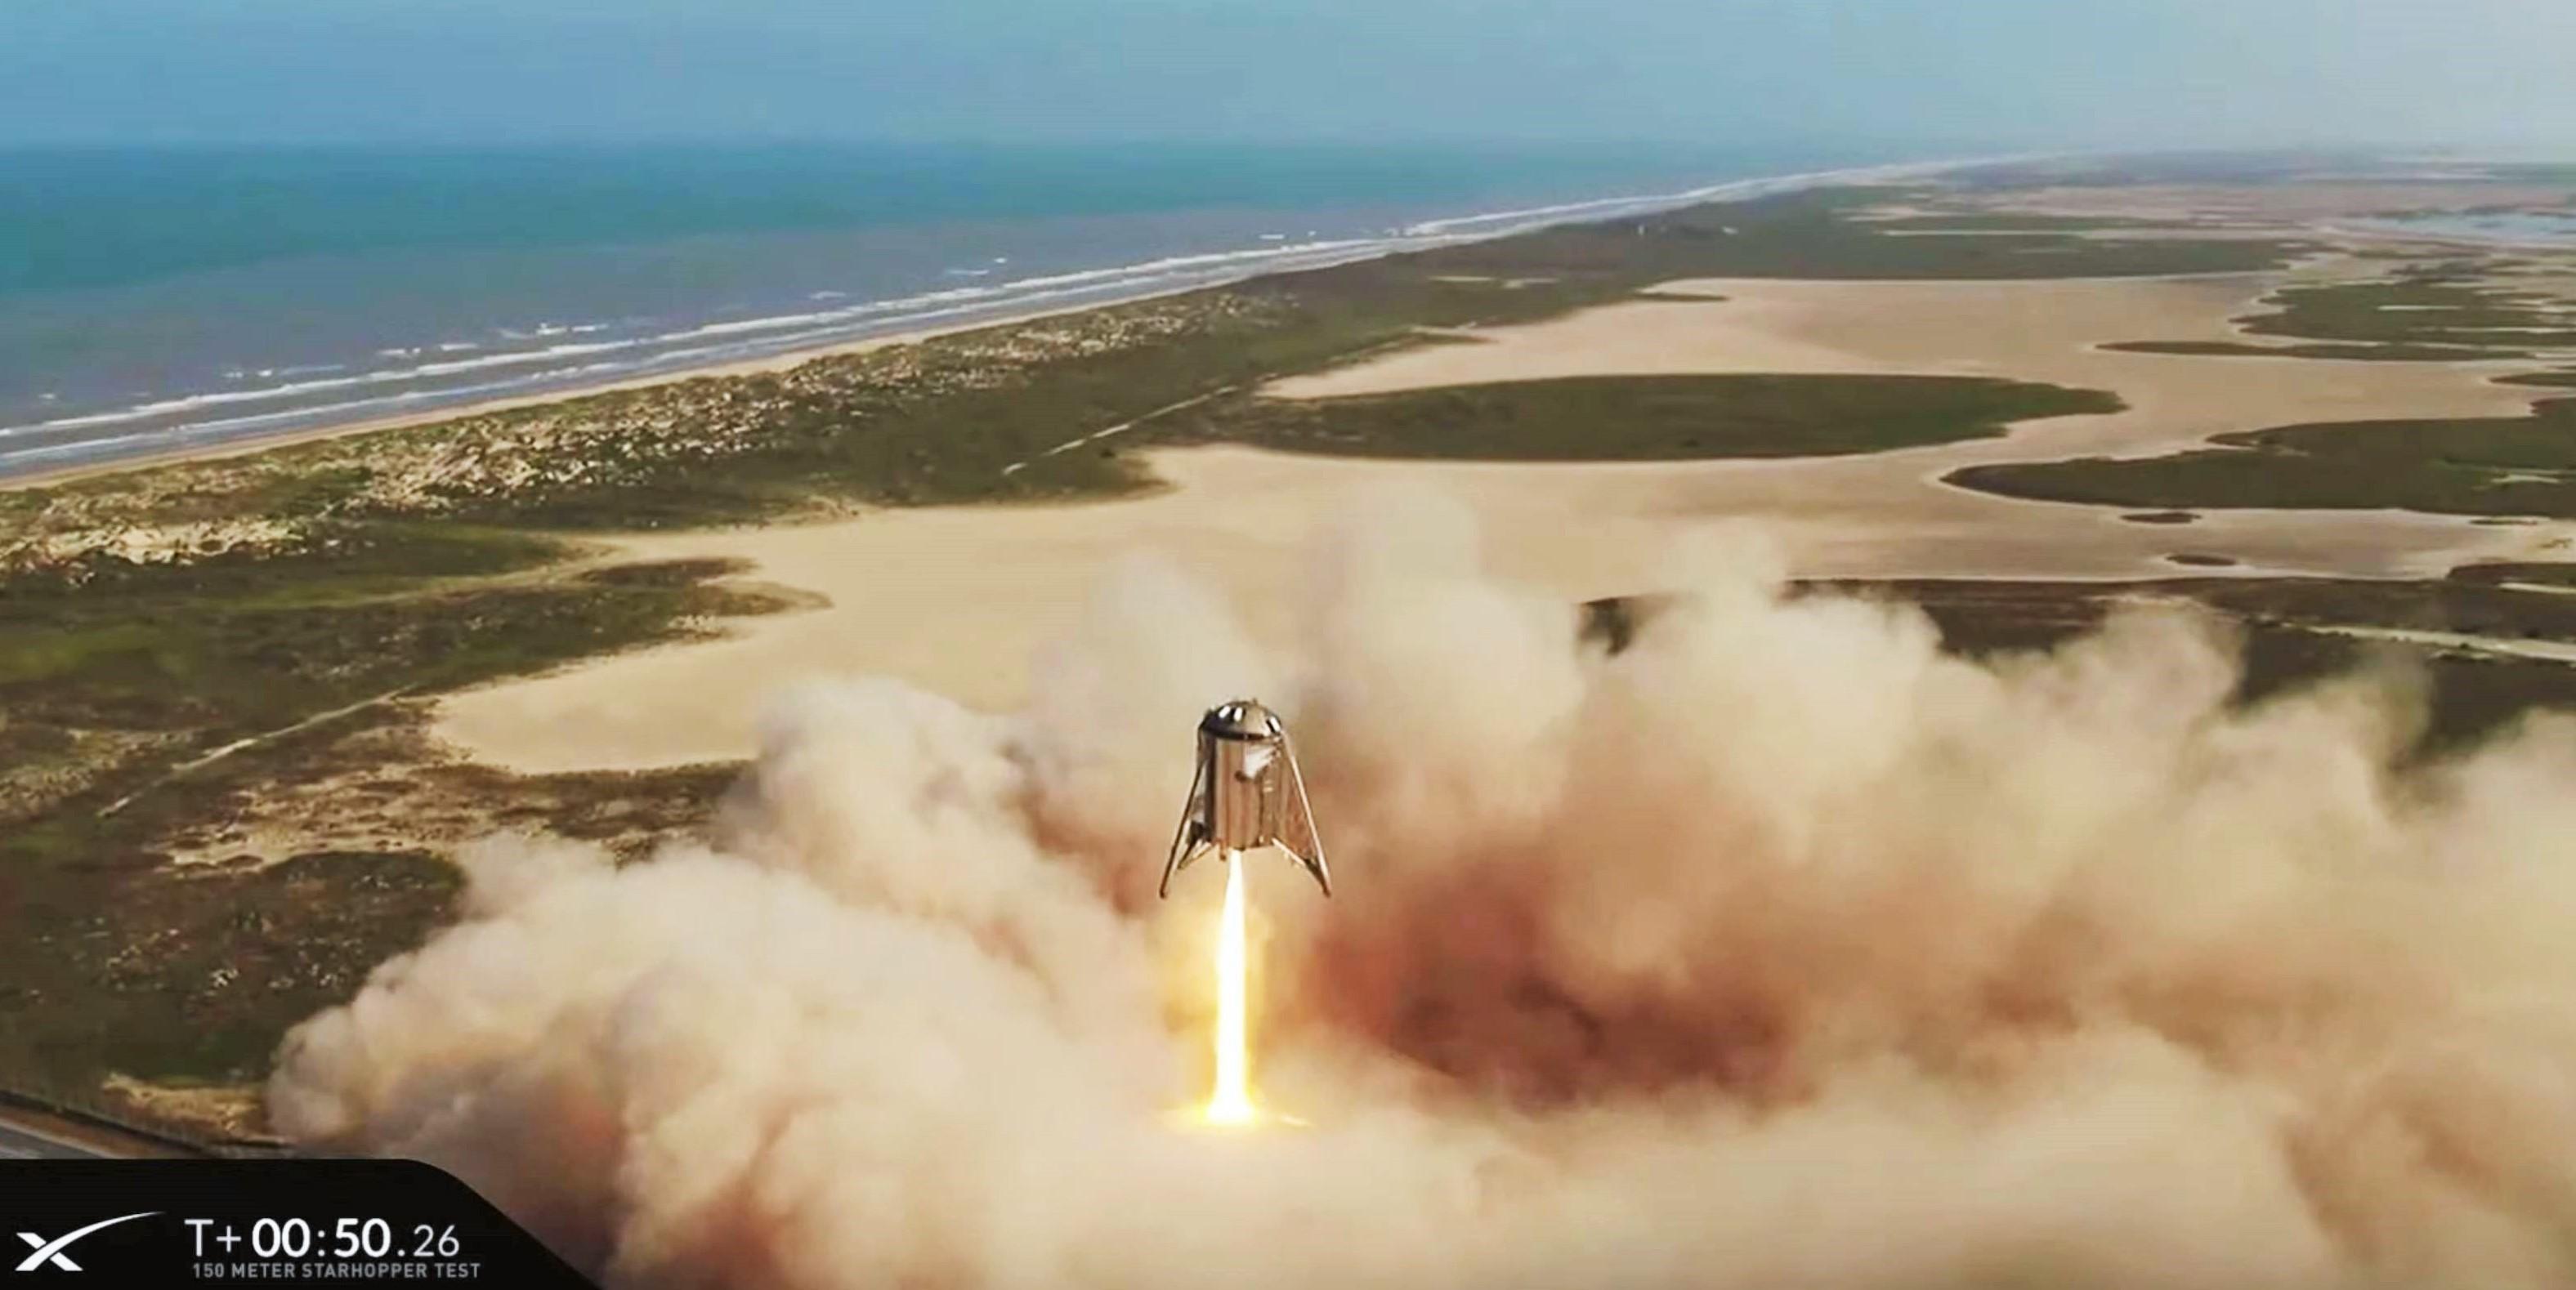 Starhopper flight 2 082719 (SpaceX) liftoff 8